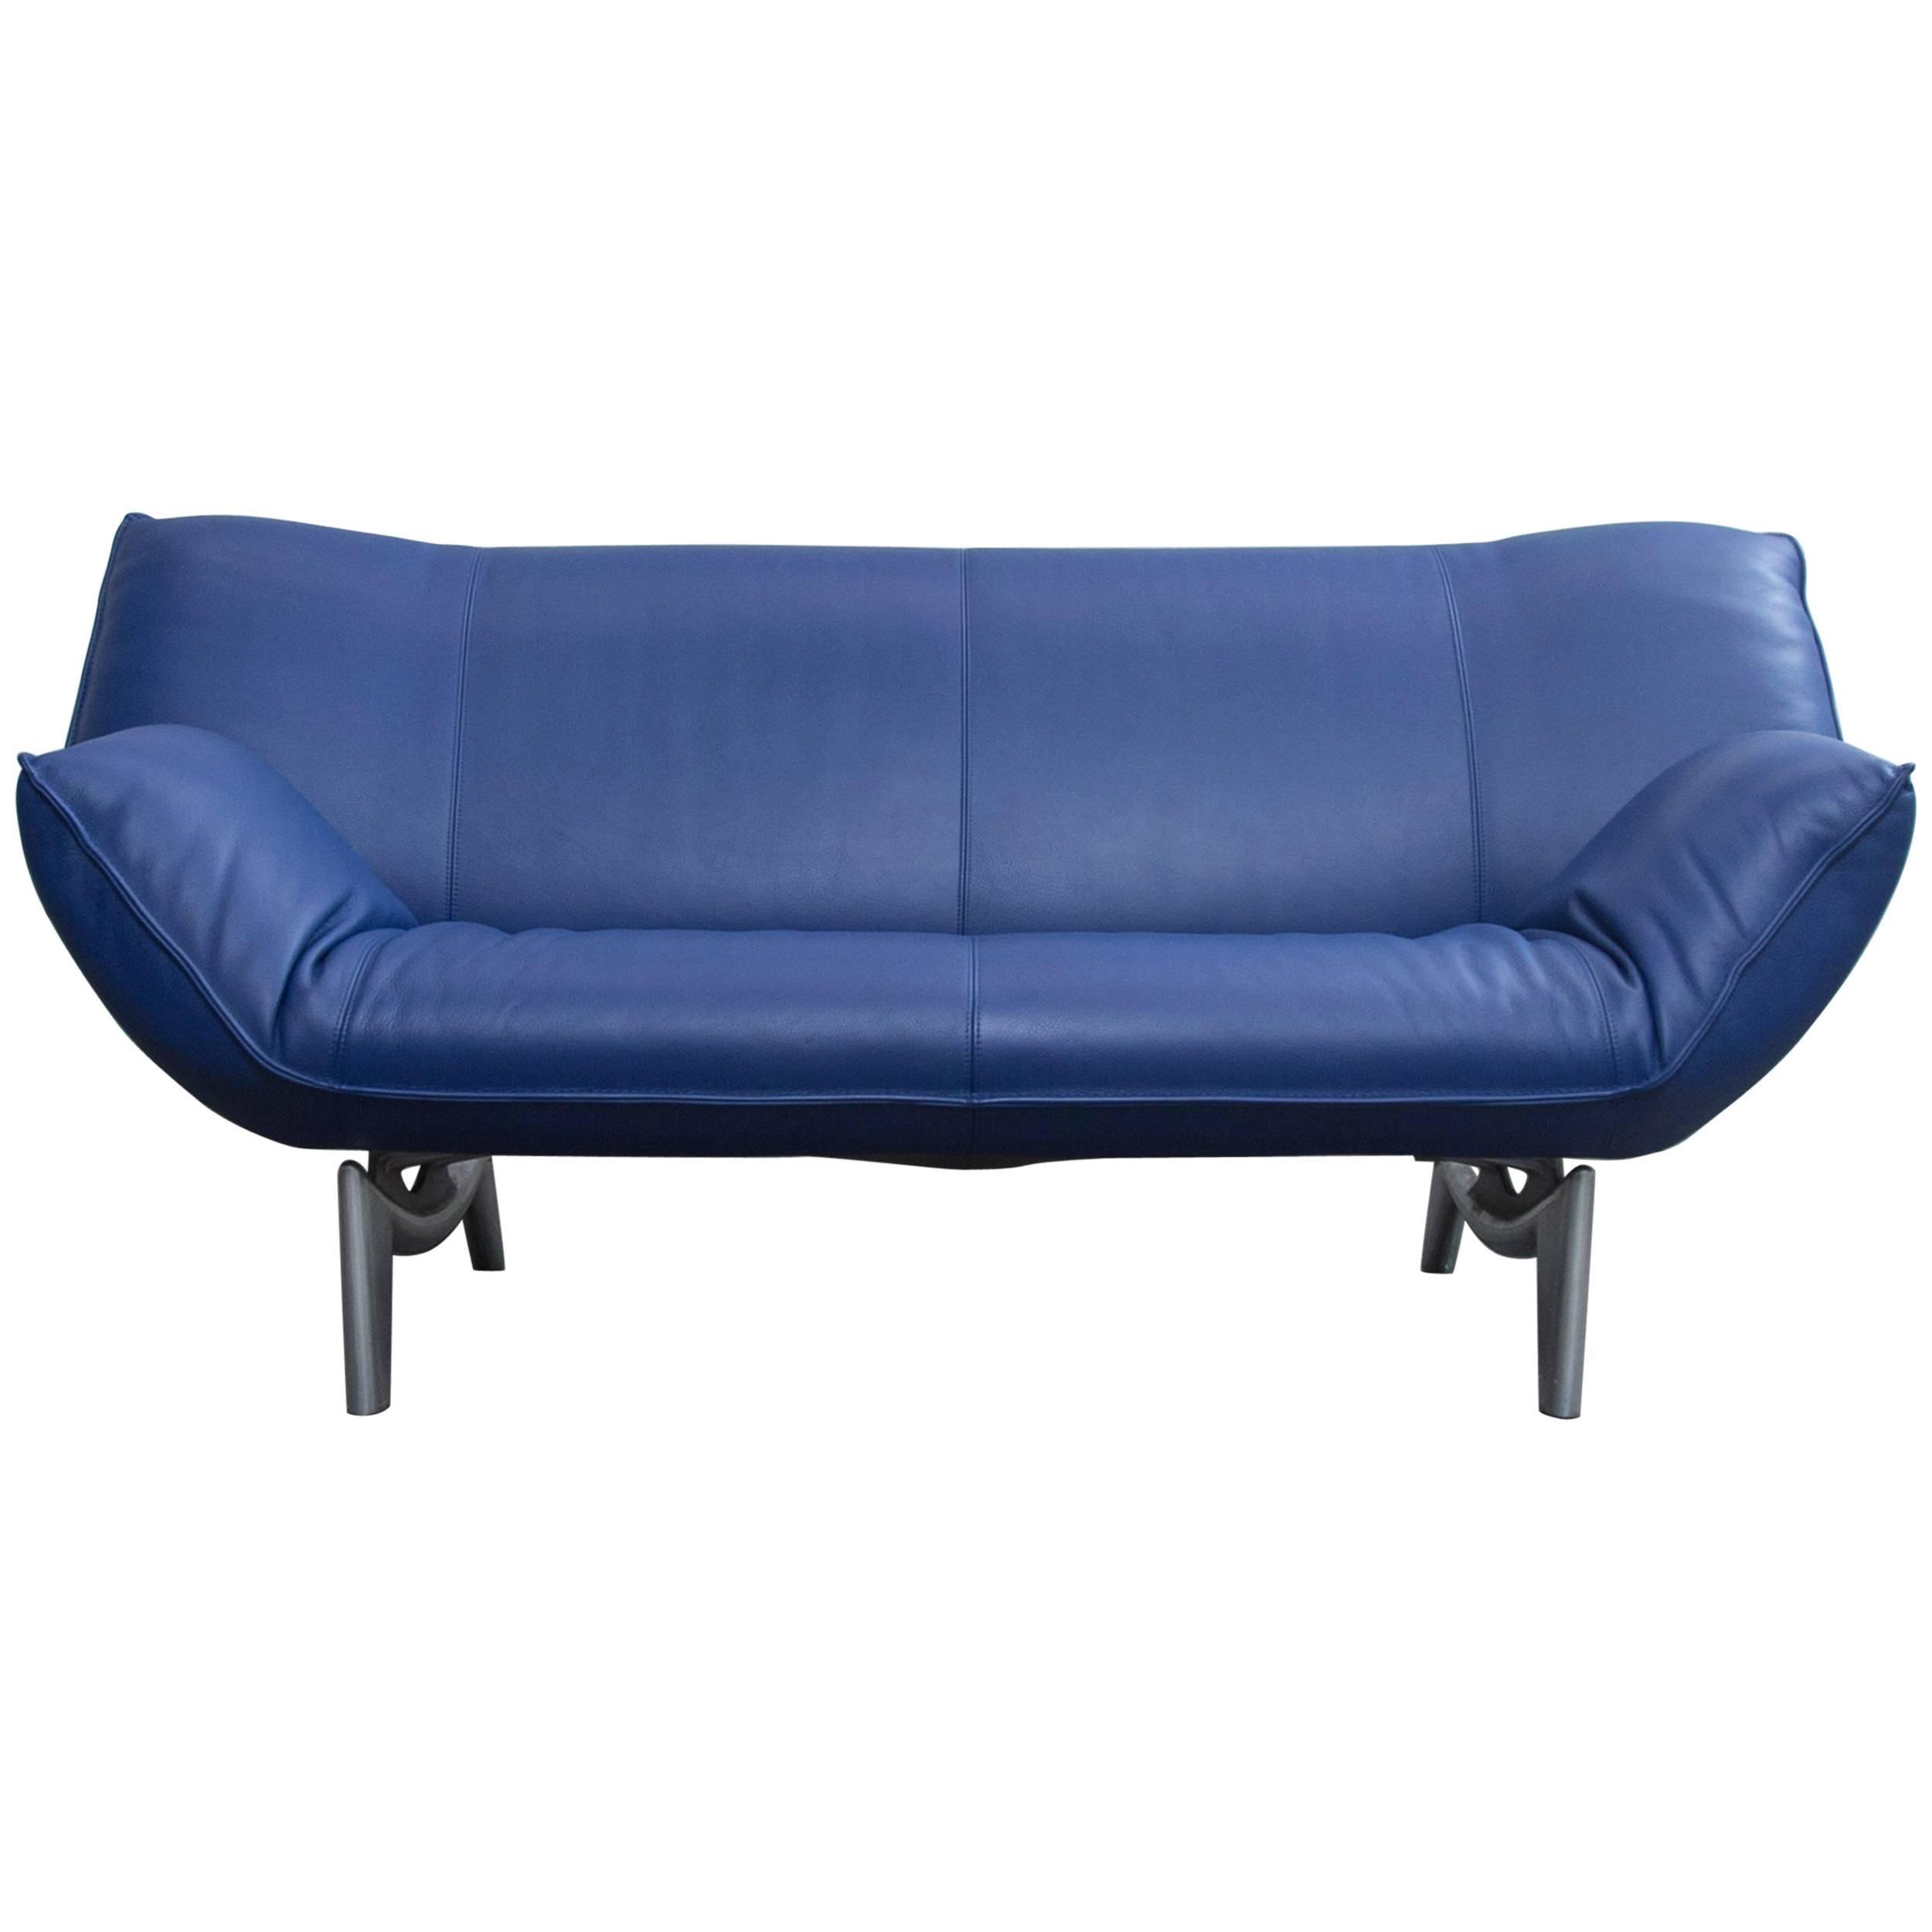 Exceptionnel Leolux Tango Designer Leather Sofa Blue Three Seat Function Modern At  1stdibs